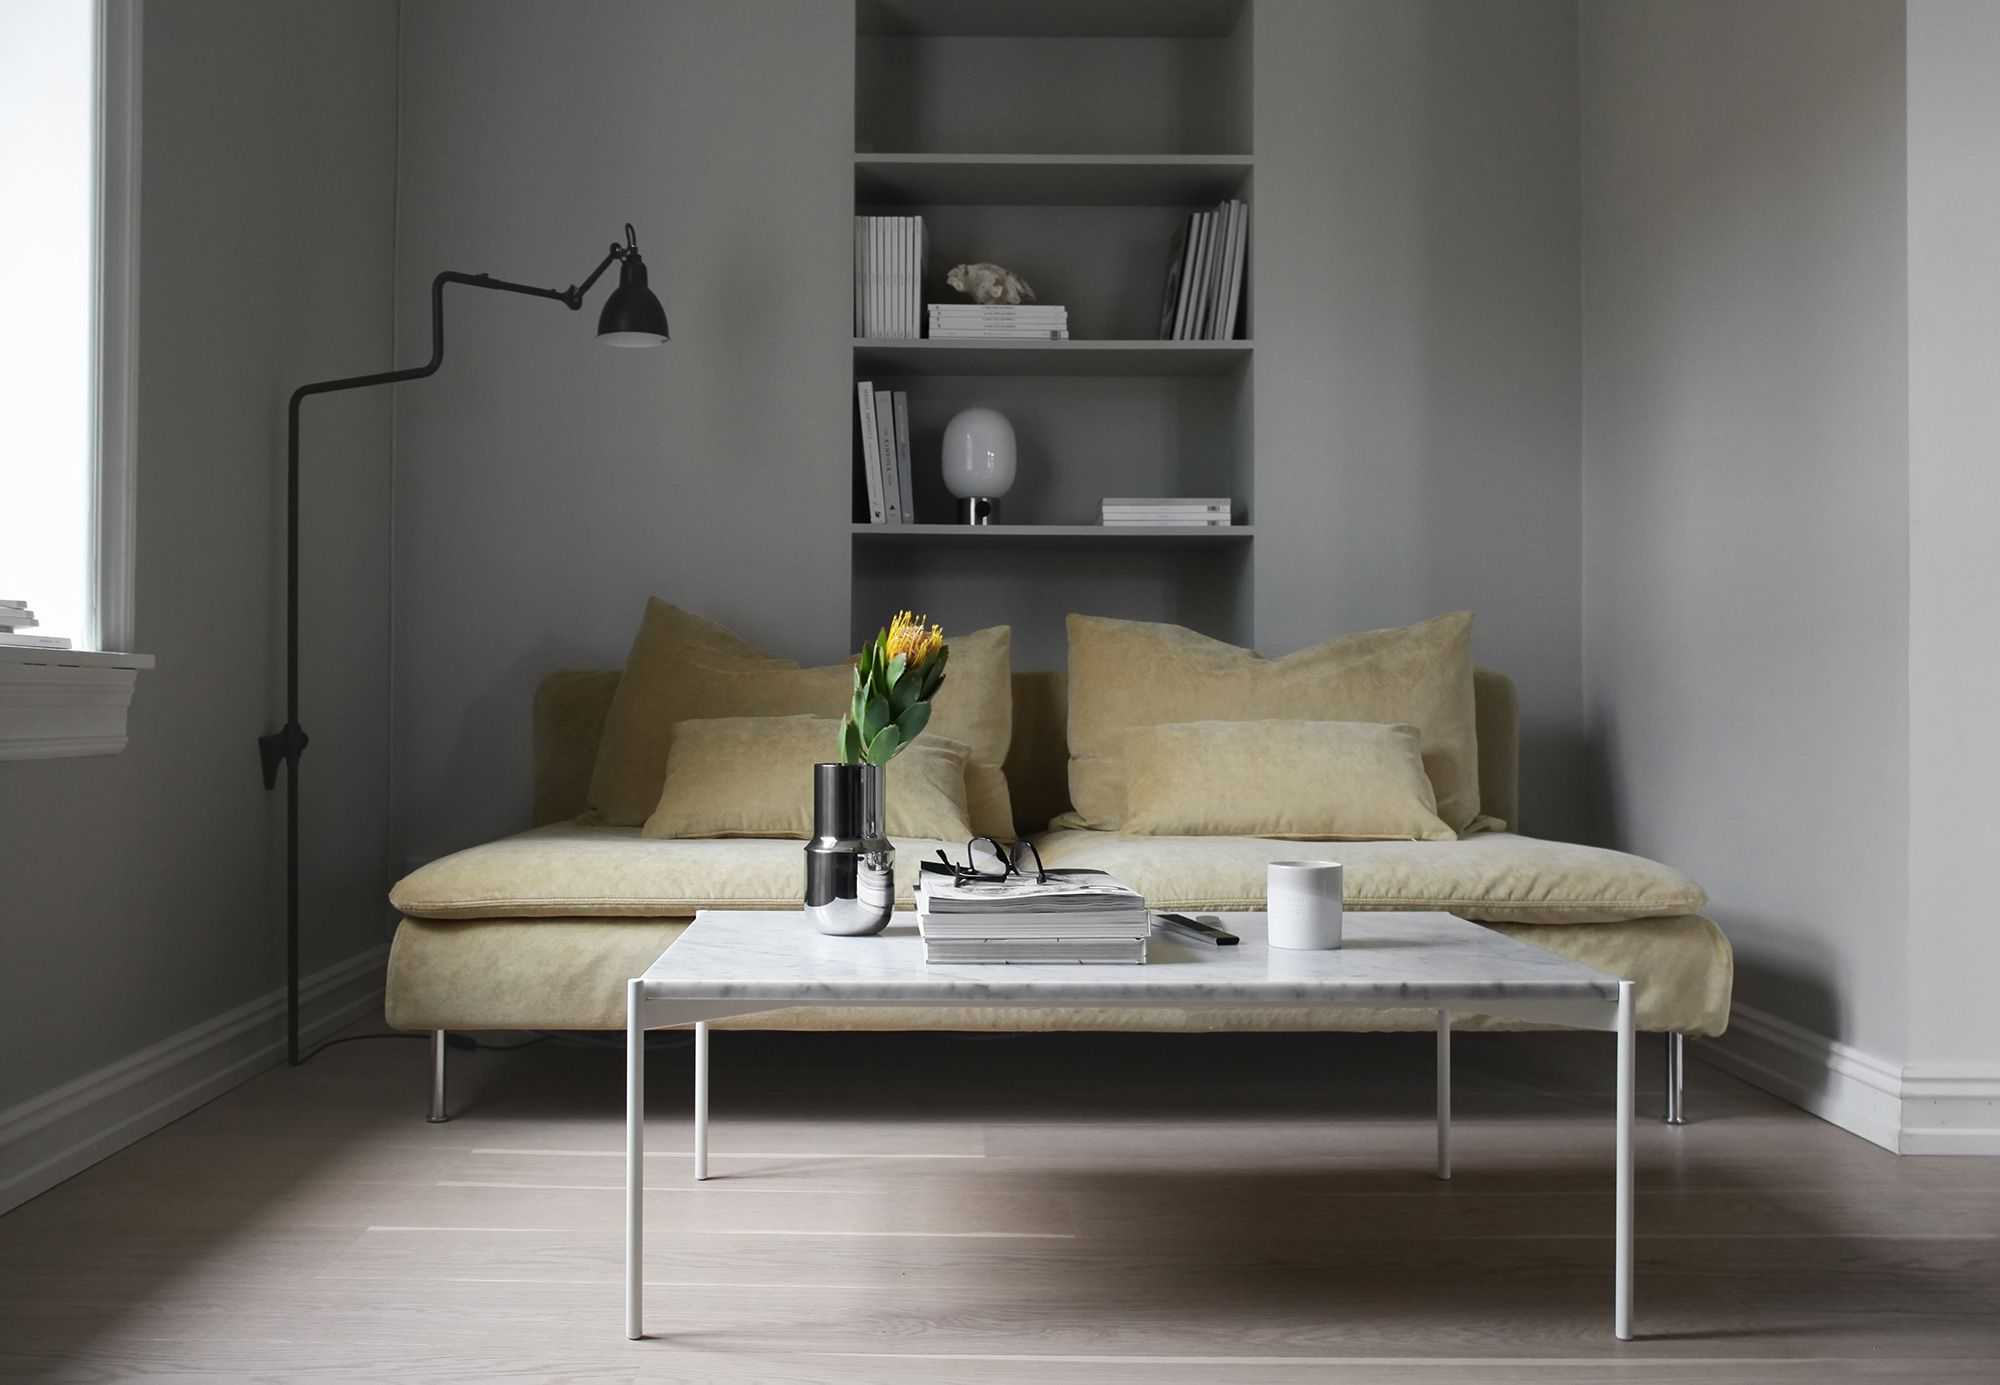 affordable ikea soderhamn hoes interesting kivik met hoes in dansbo beige en wohnwelt pallen